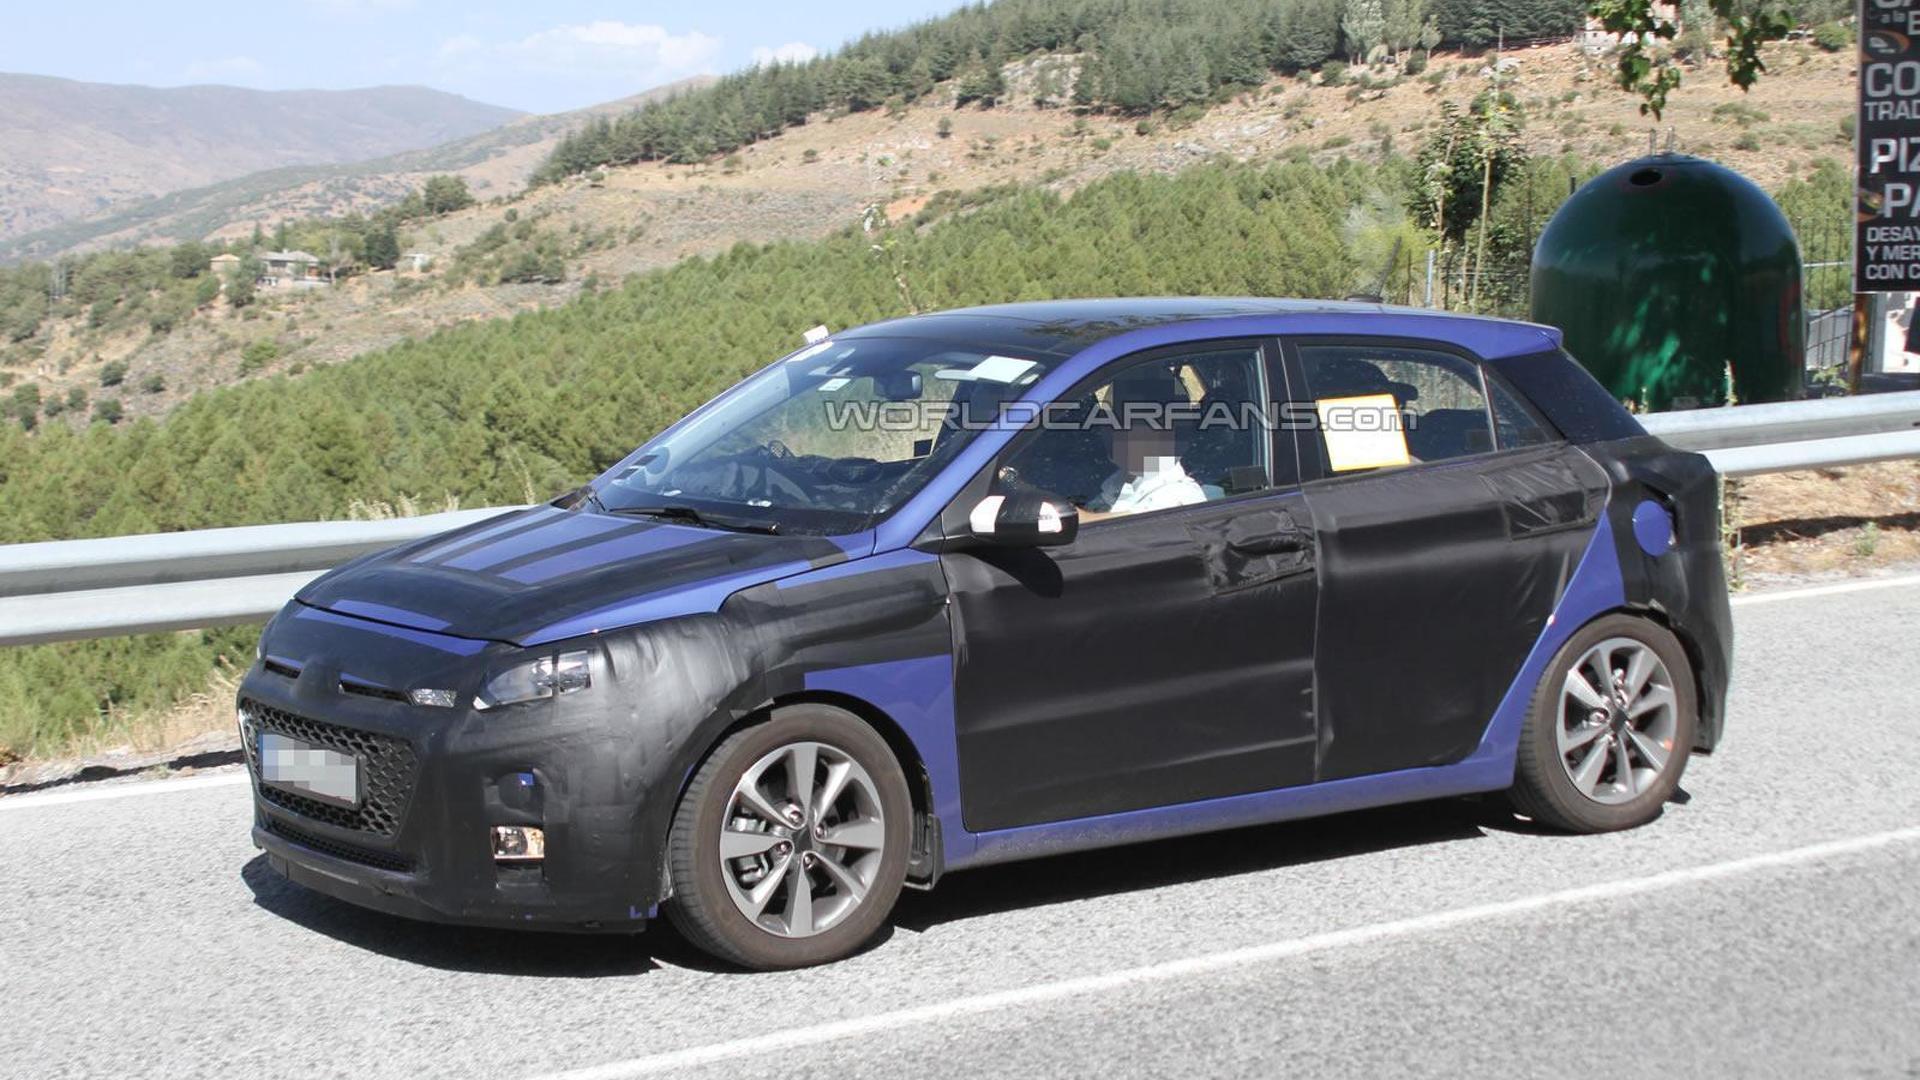 Next-gen Hyundai i20 spied in southern Europe